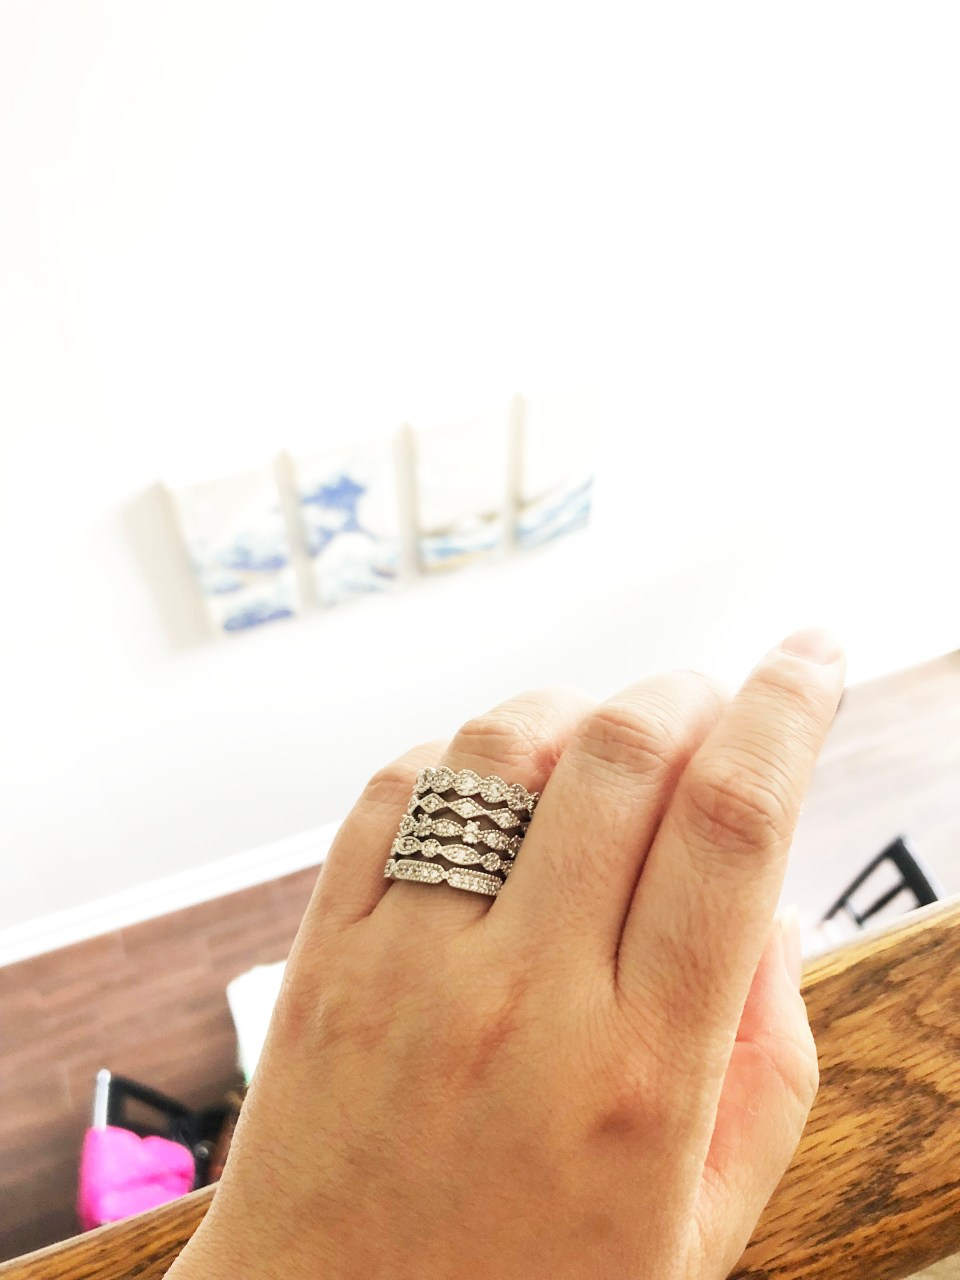 PalmBeach Jewelry - Eternity Ring Stack 7